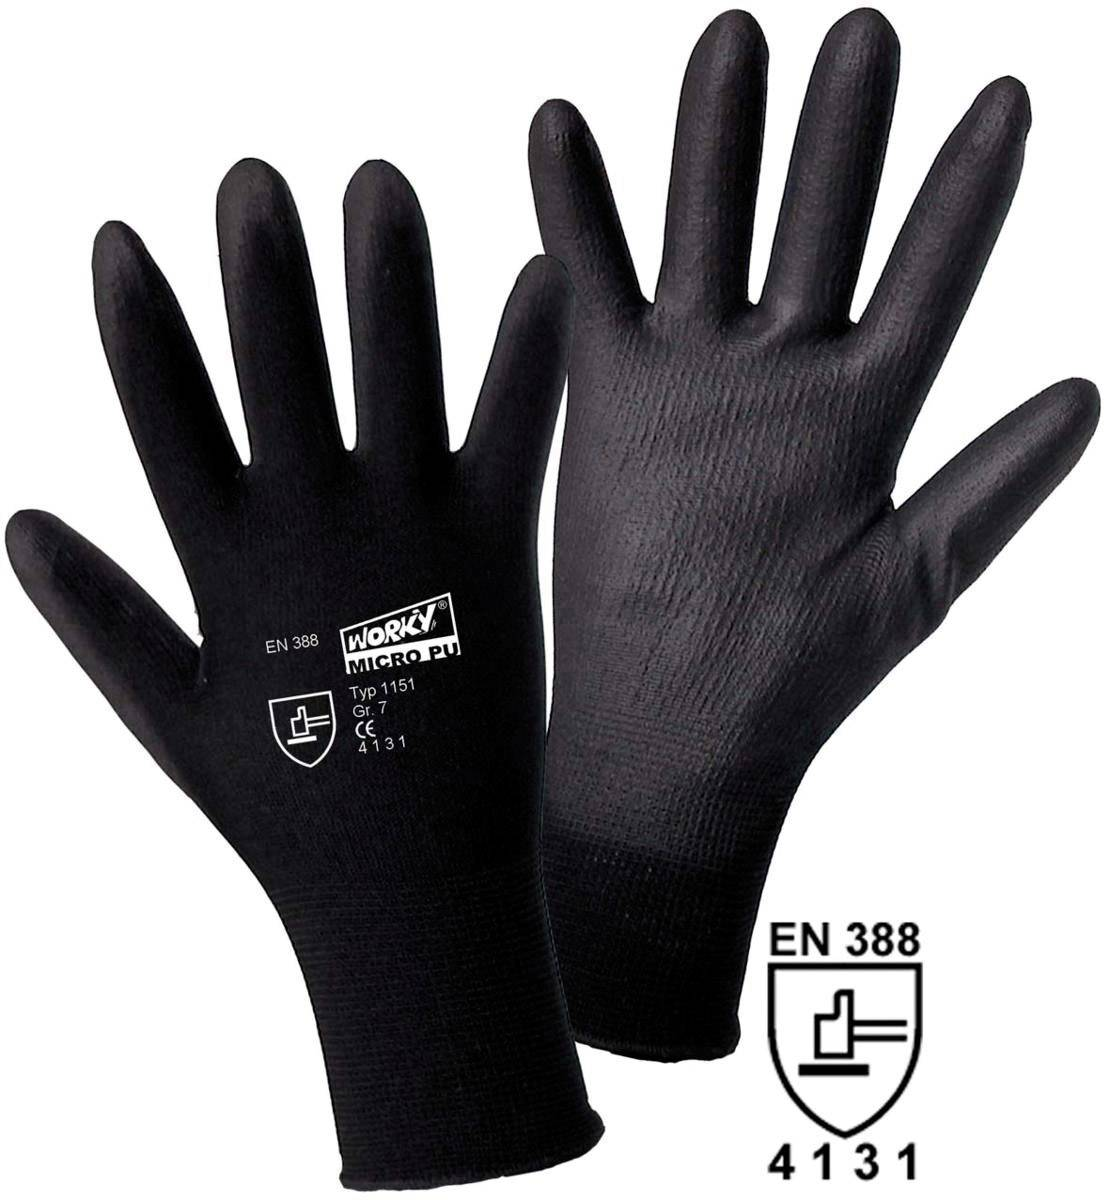 Nylon Arbeitshandschuh Größe ( ... MICRO black Nylon-PU 1151 1 Paar